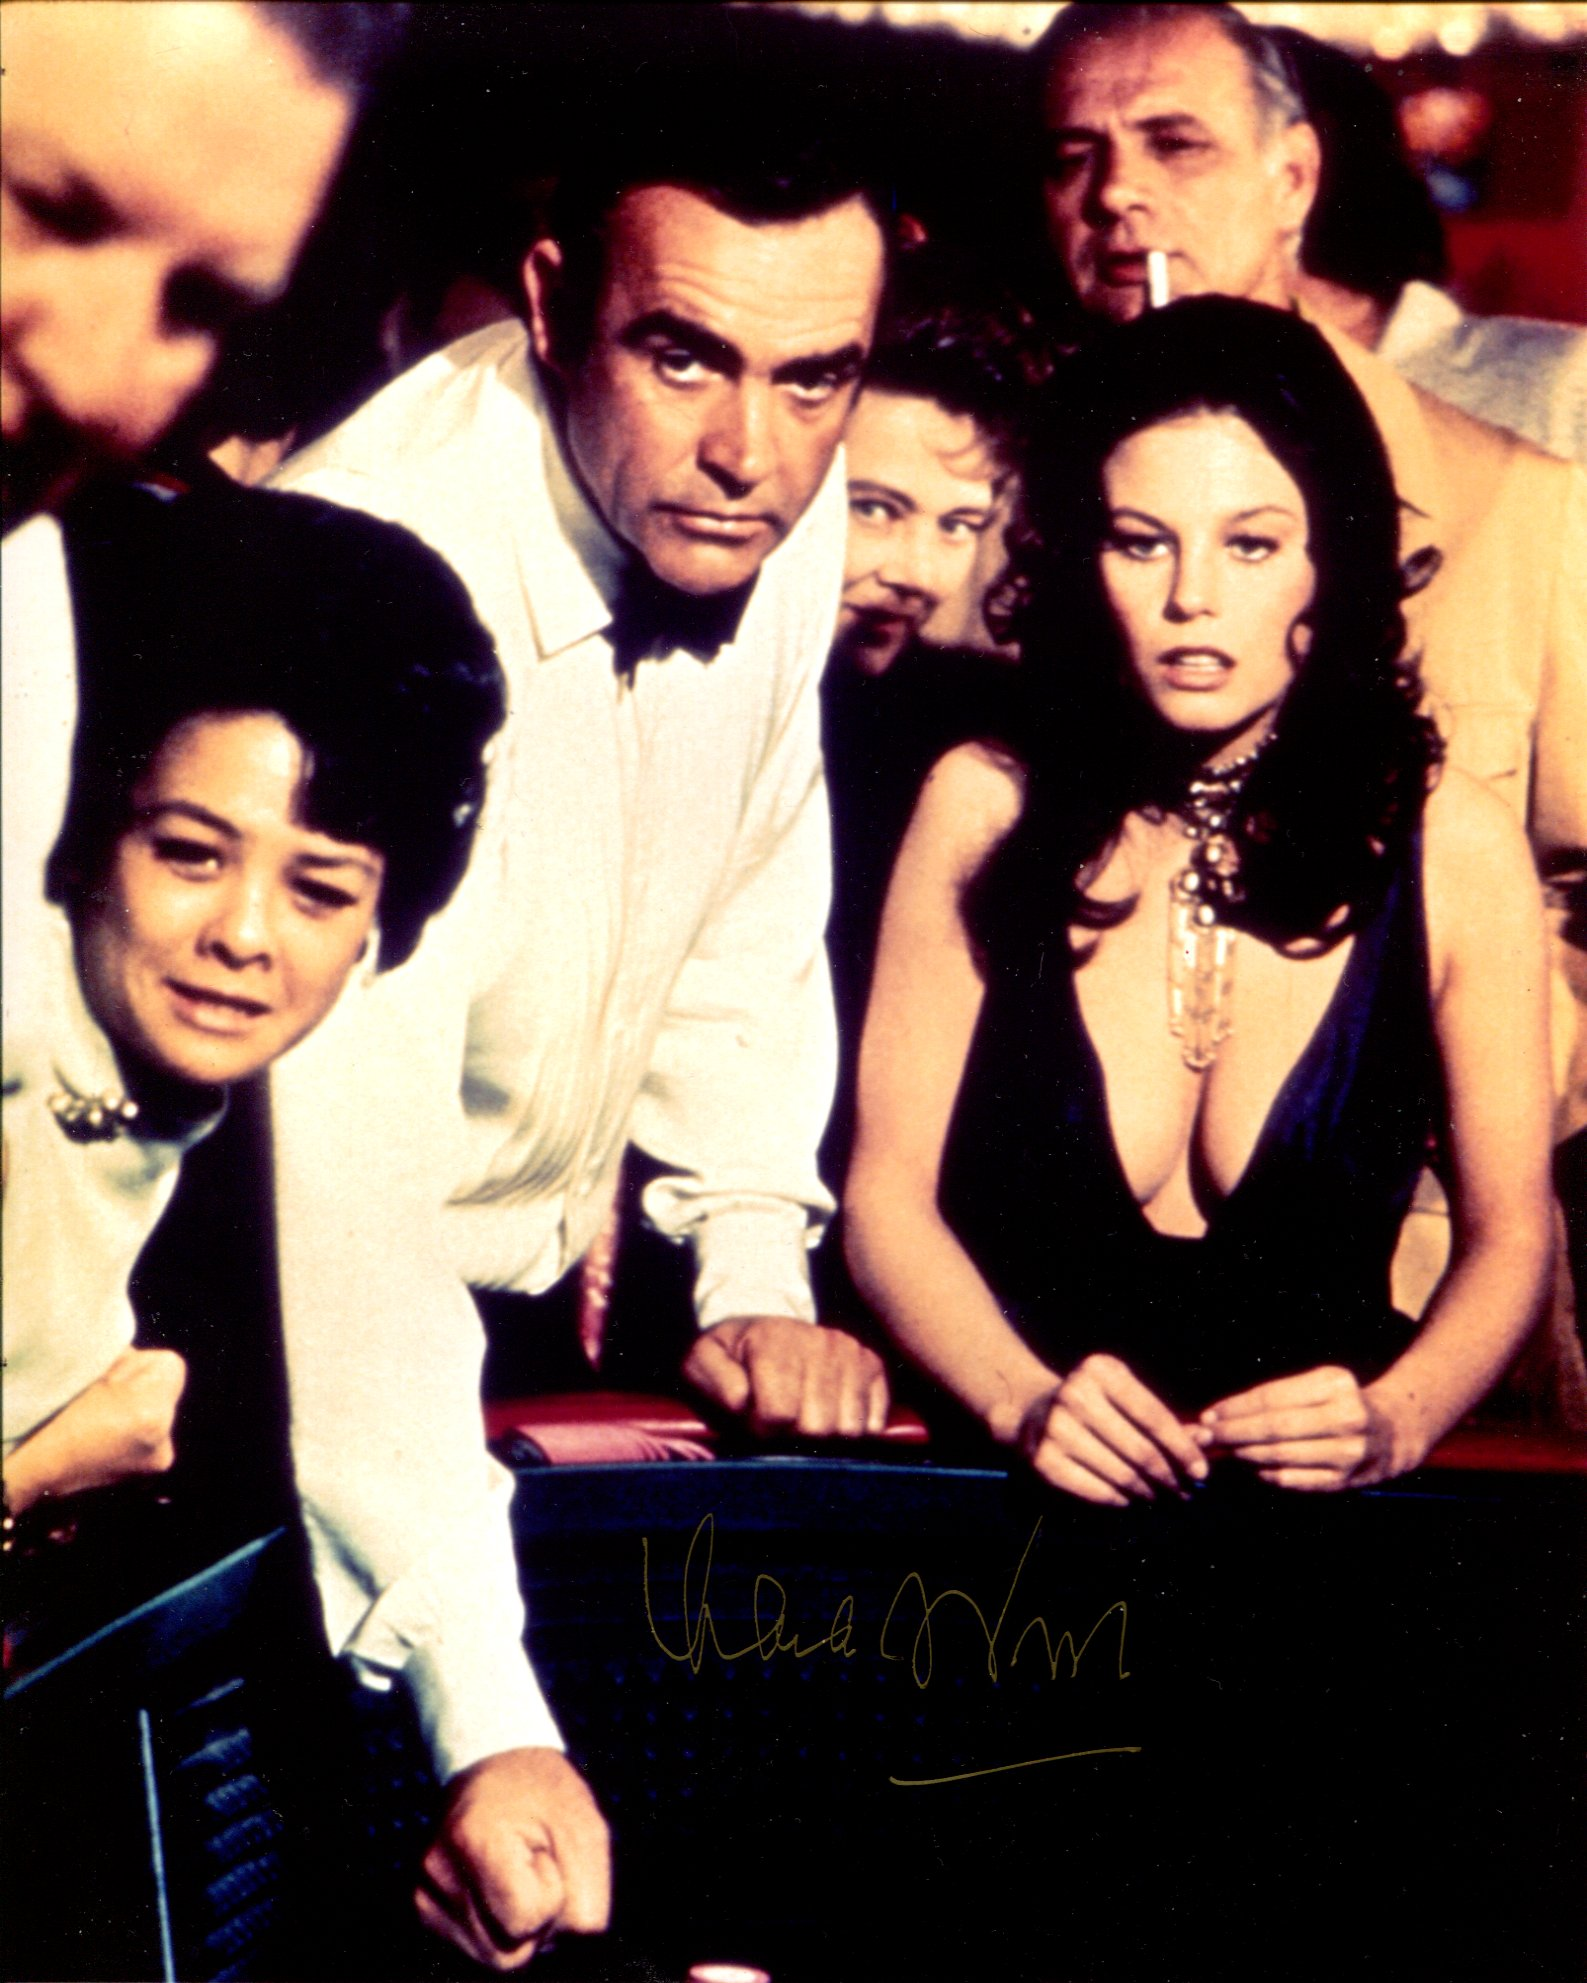 007 James Bond girl Lana wood signed 8x10 Diamonds Are Forever casino scene photo. Good condition.